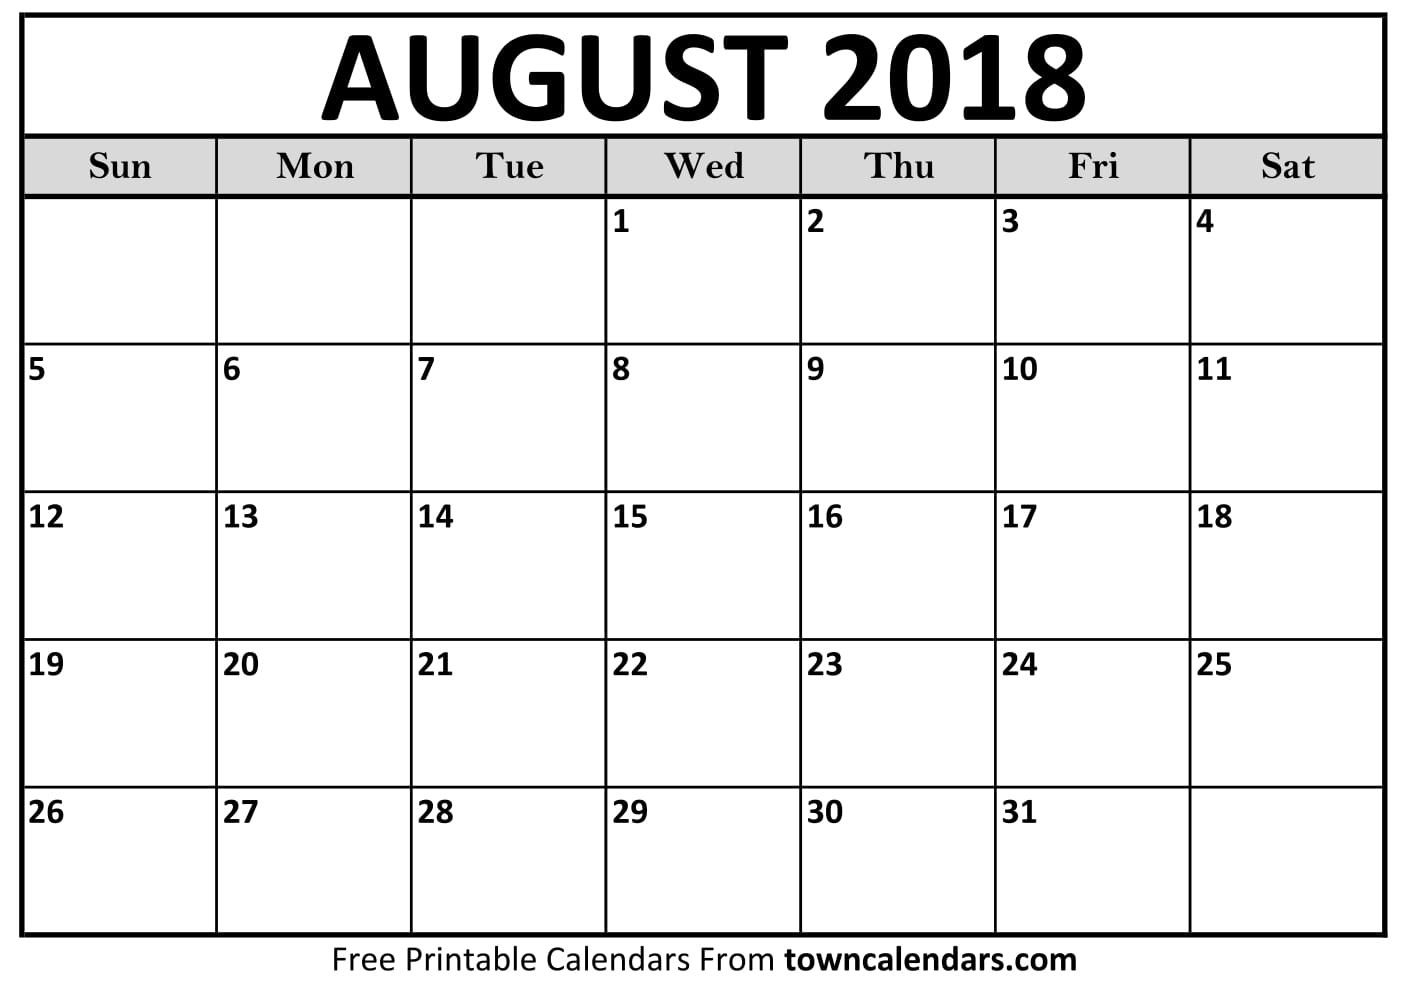 August Keeping Life Sane Printable Schedule Template Calendar